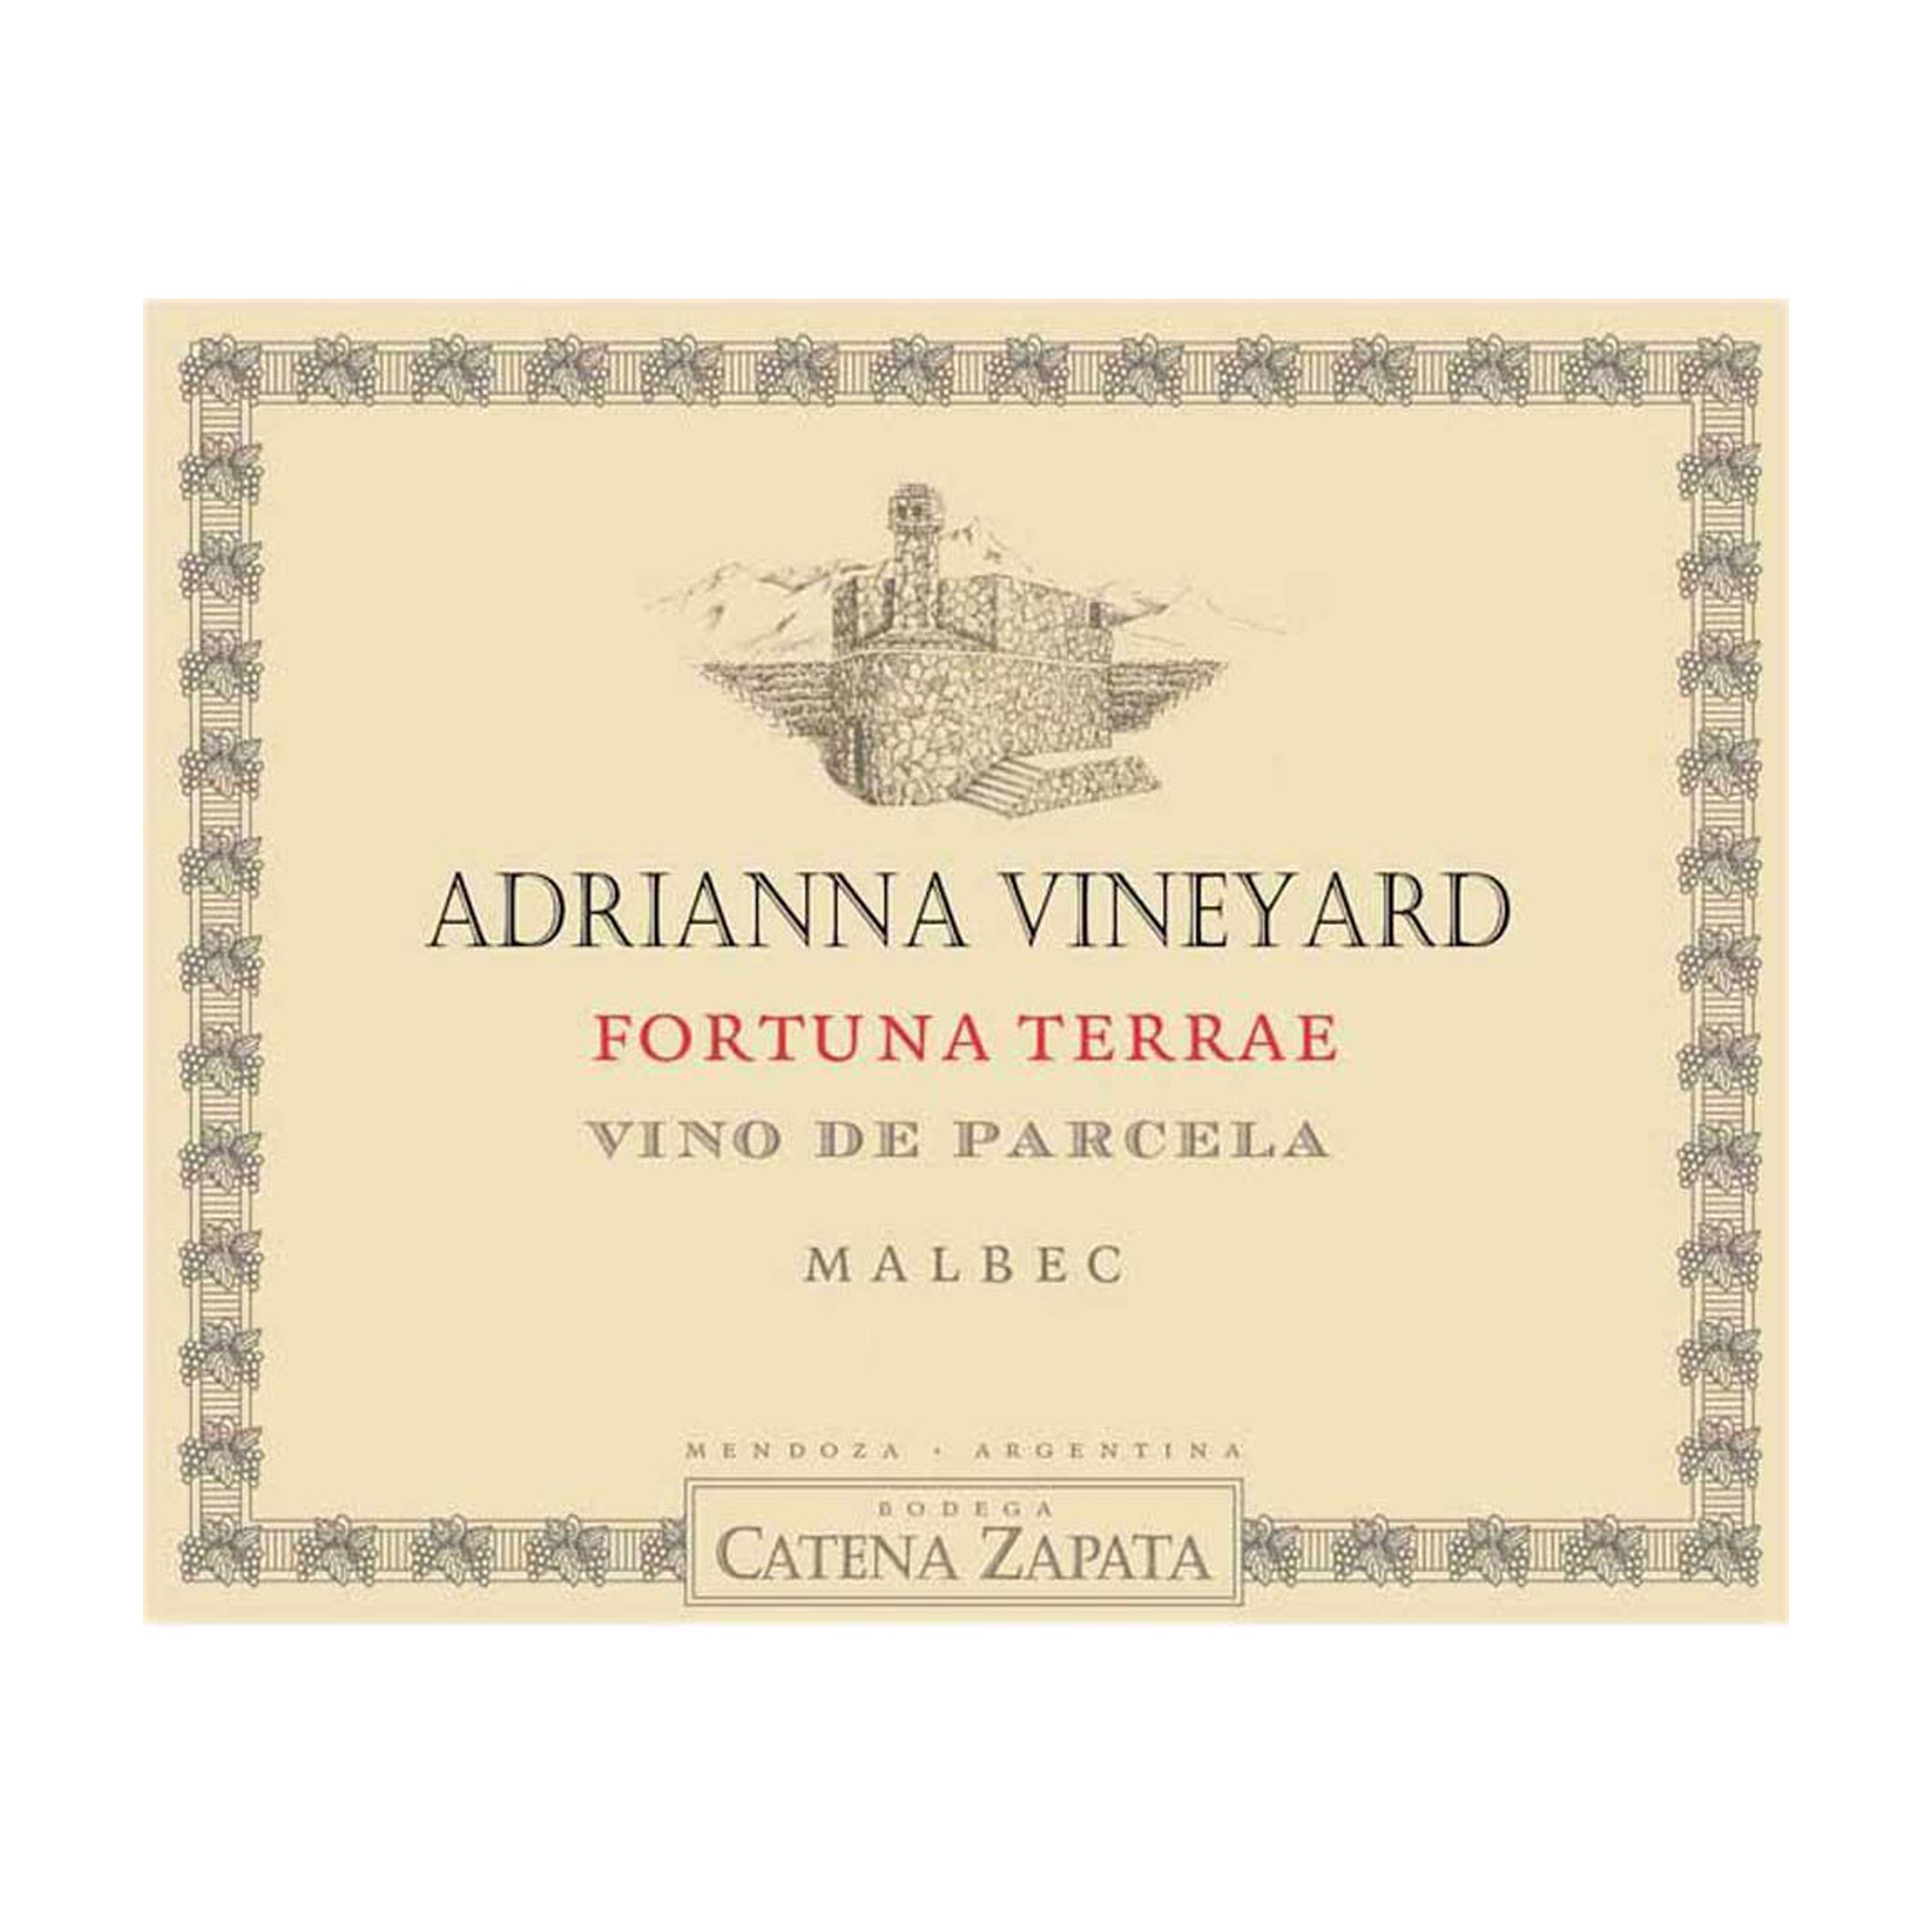 Catena Zapata Adrianna Vineyard Fortuna Terrae Malbec 2013 (3x75cl)